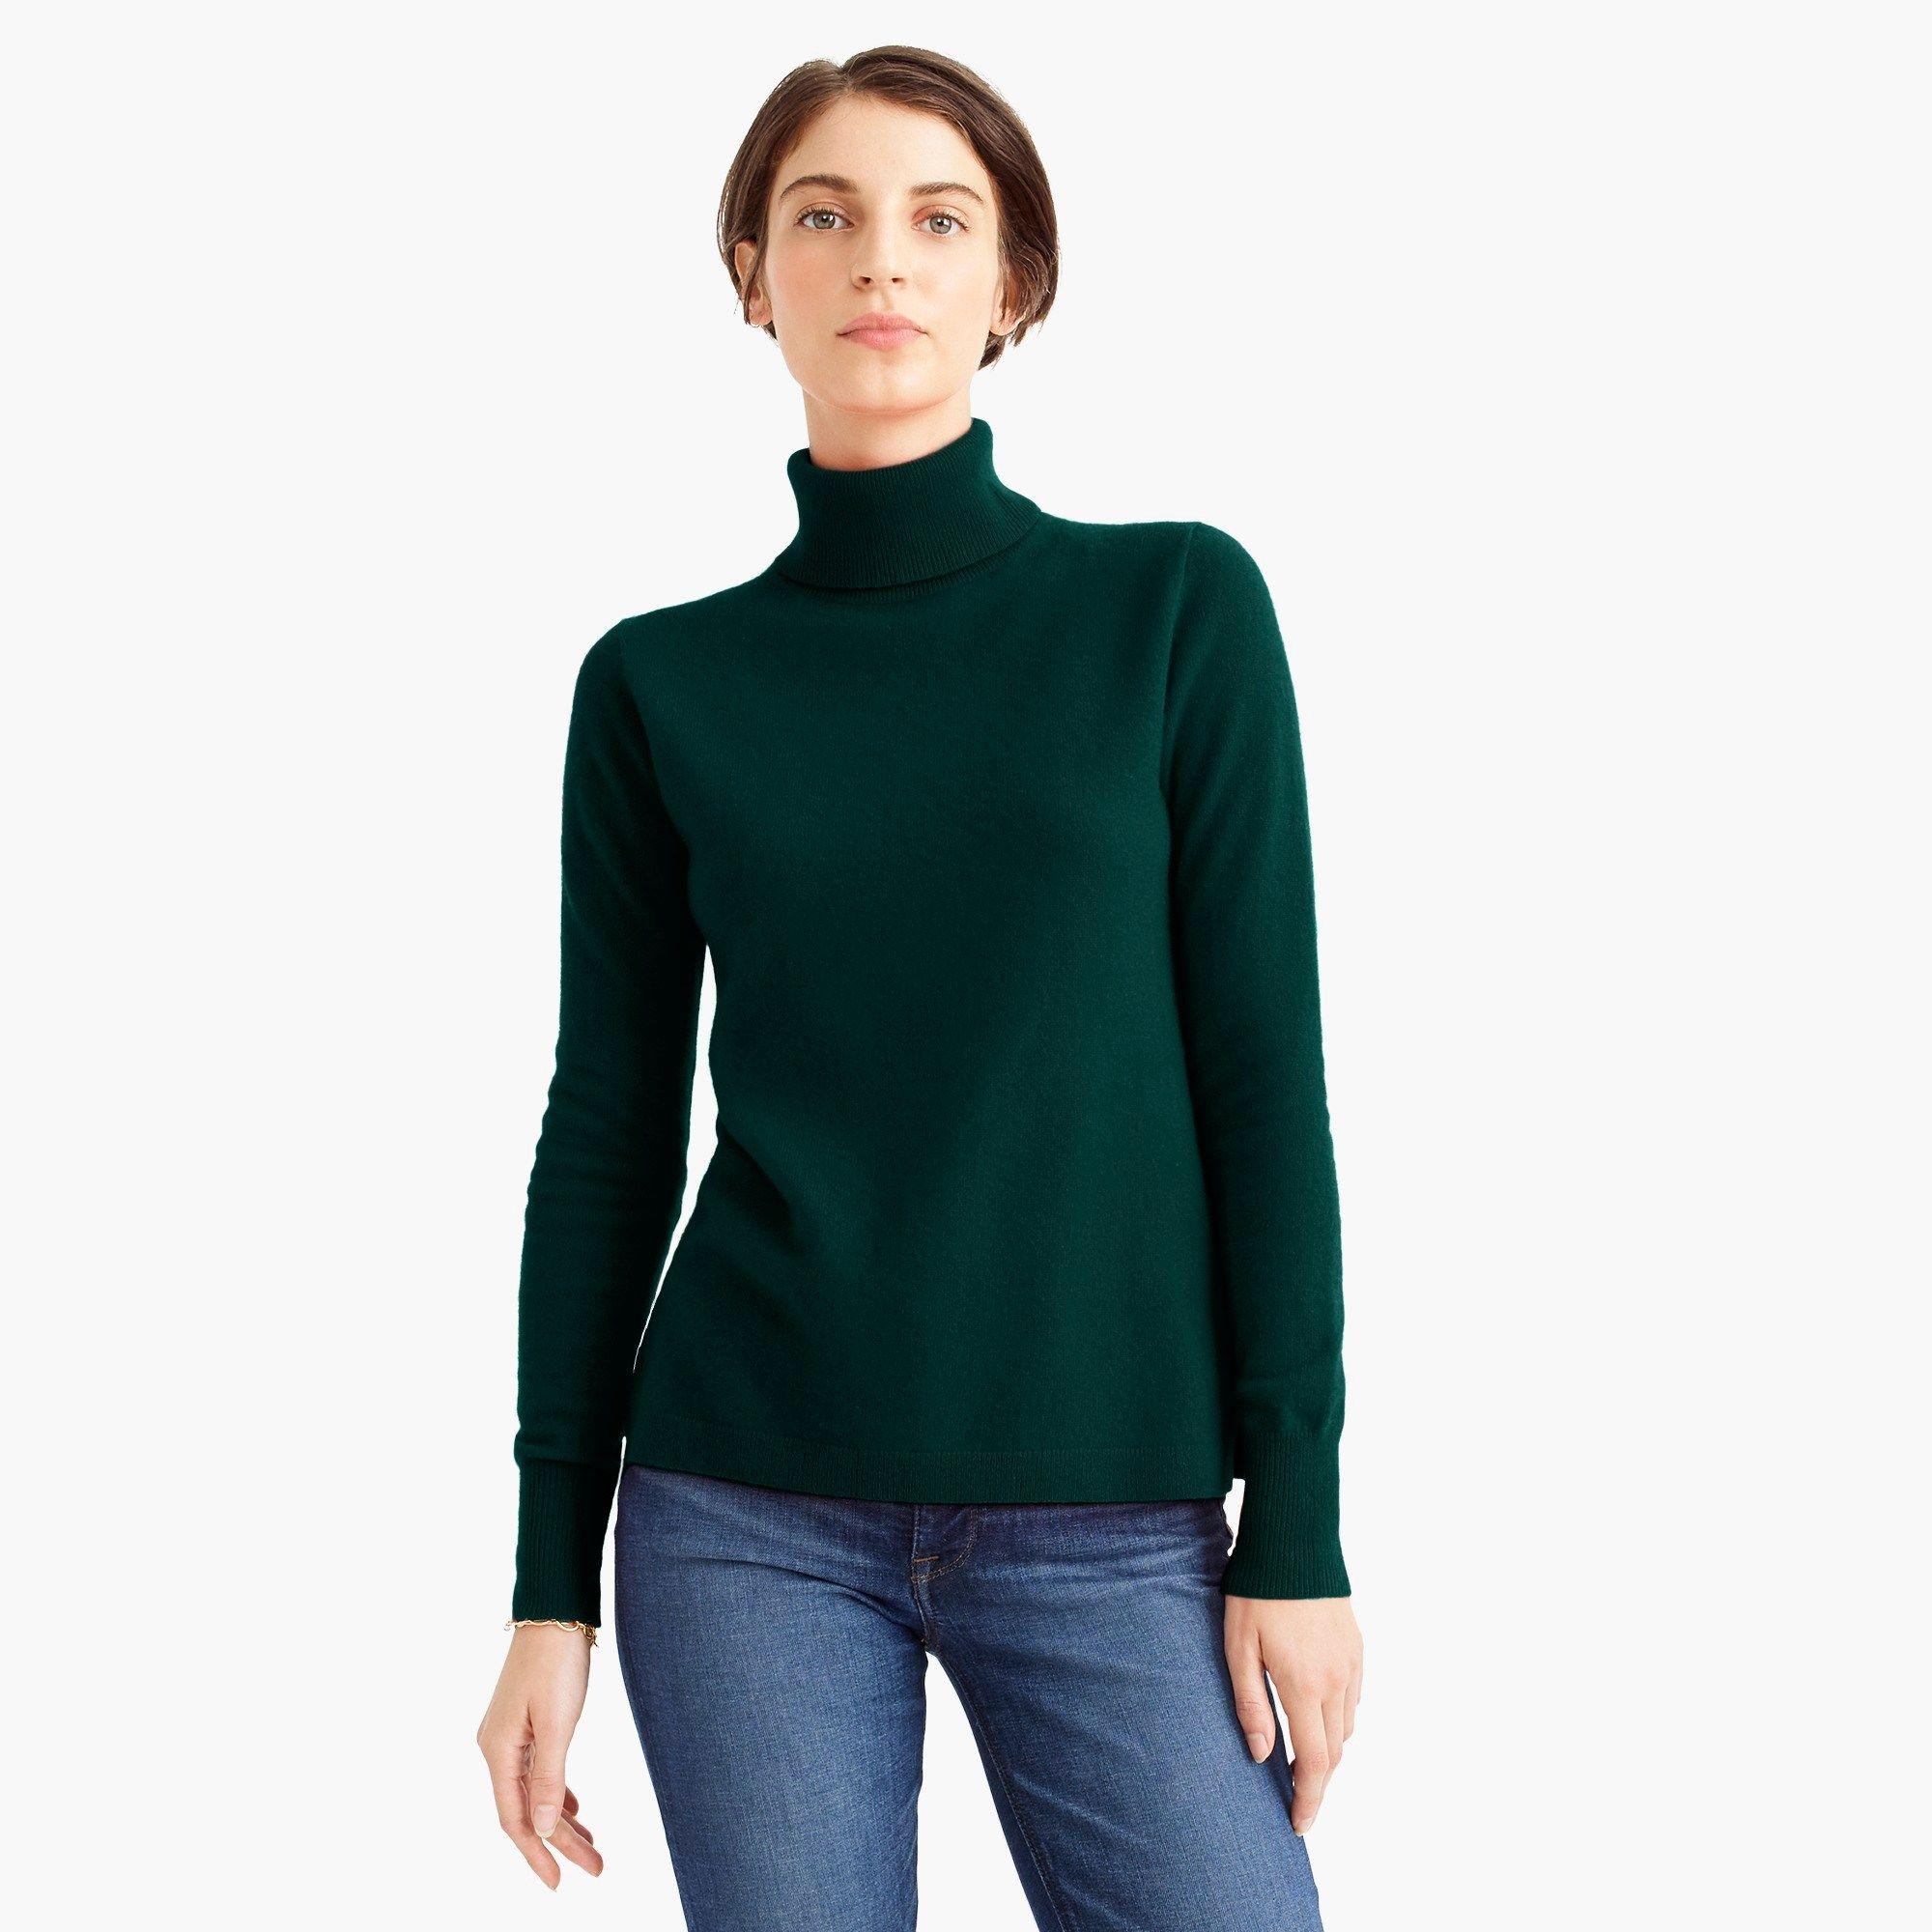 Everyday cashmere turtleneck sweater | Cashmere turtleneck